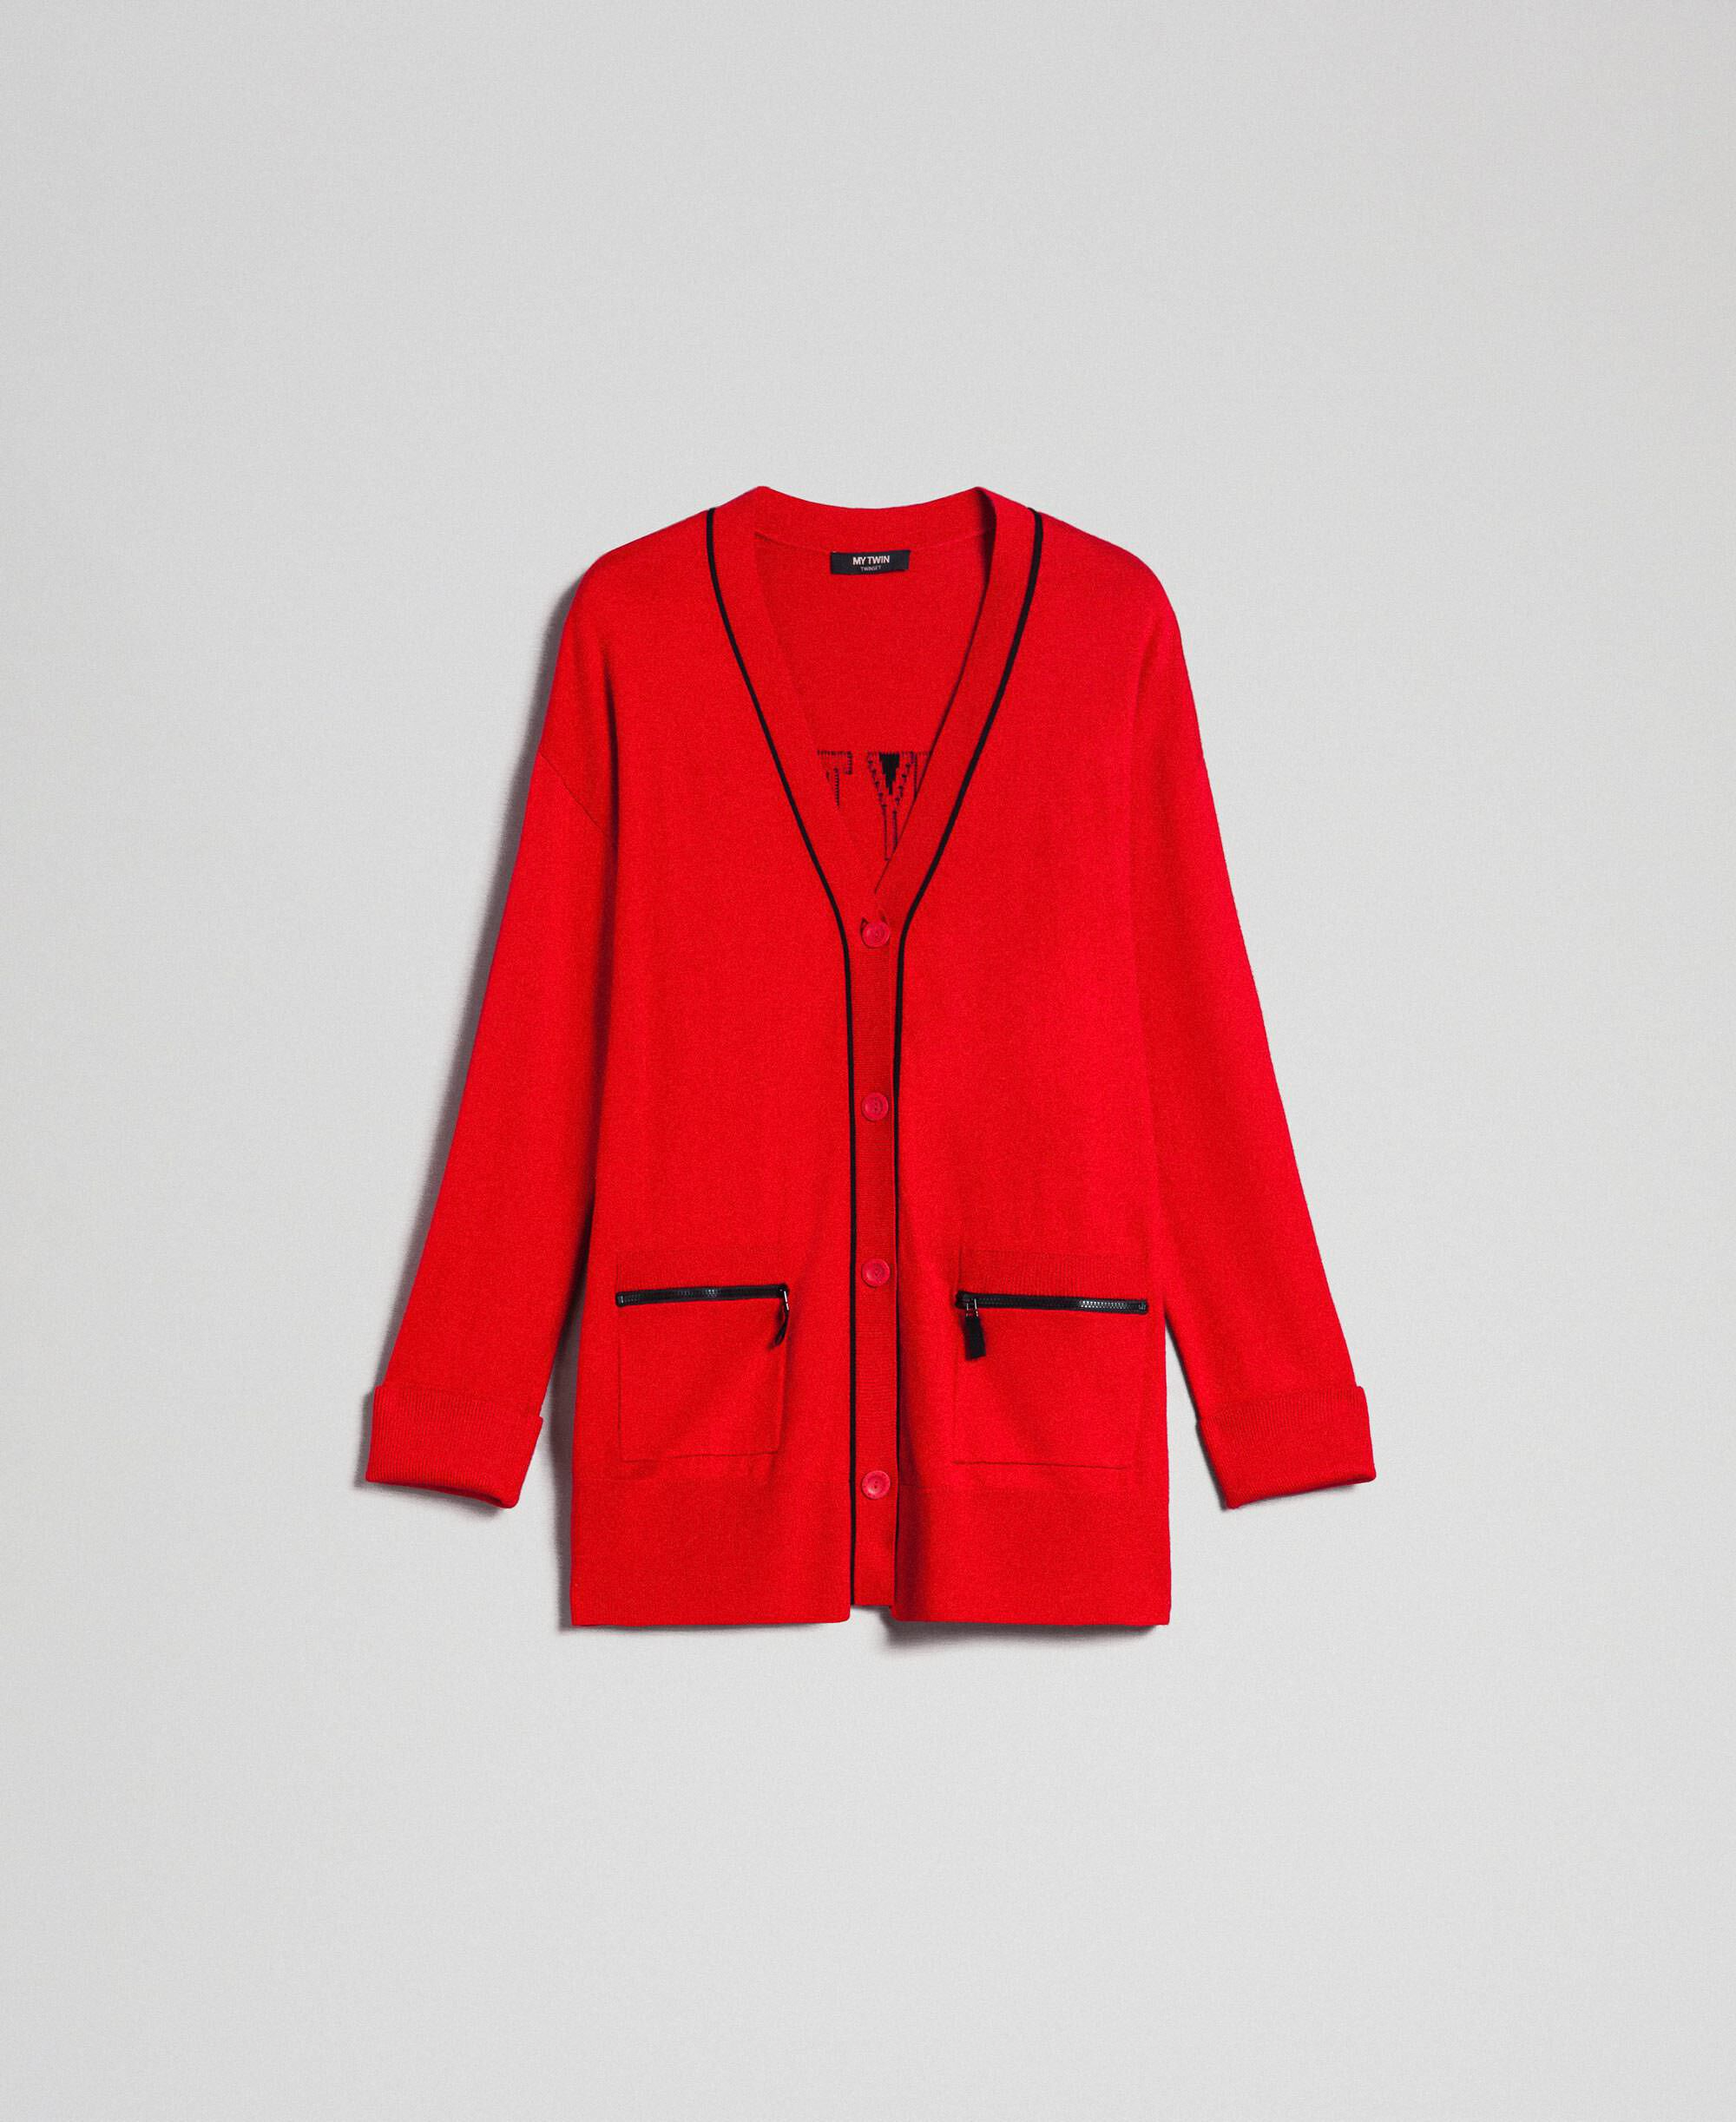 X two Red Damayanti Cardigan Giacca Donna Plus dimensioni Lagenlook